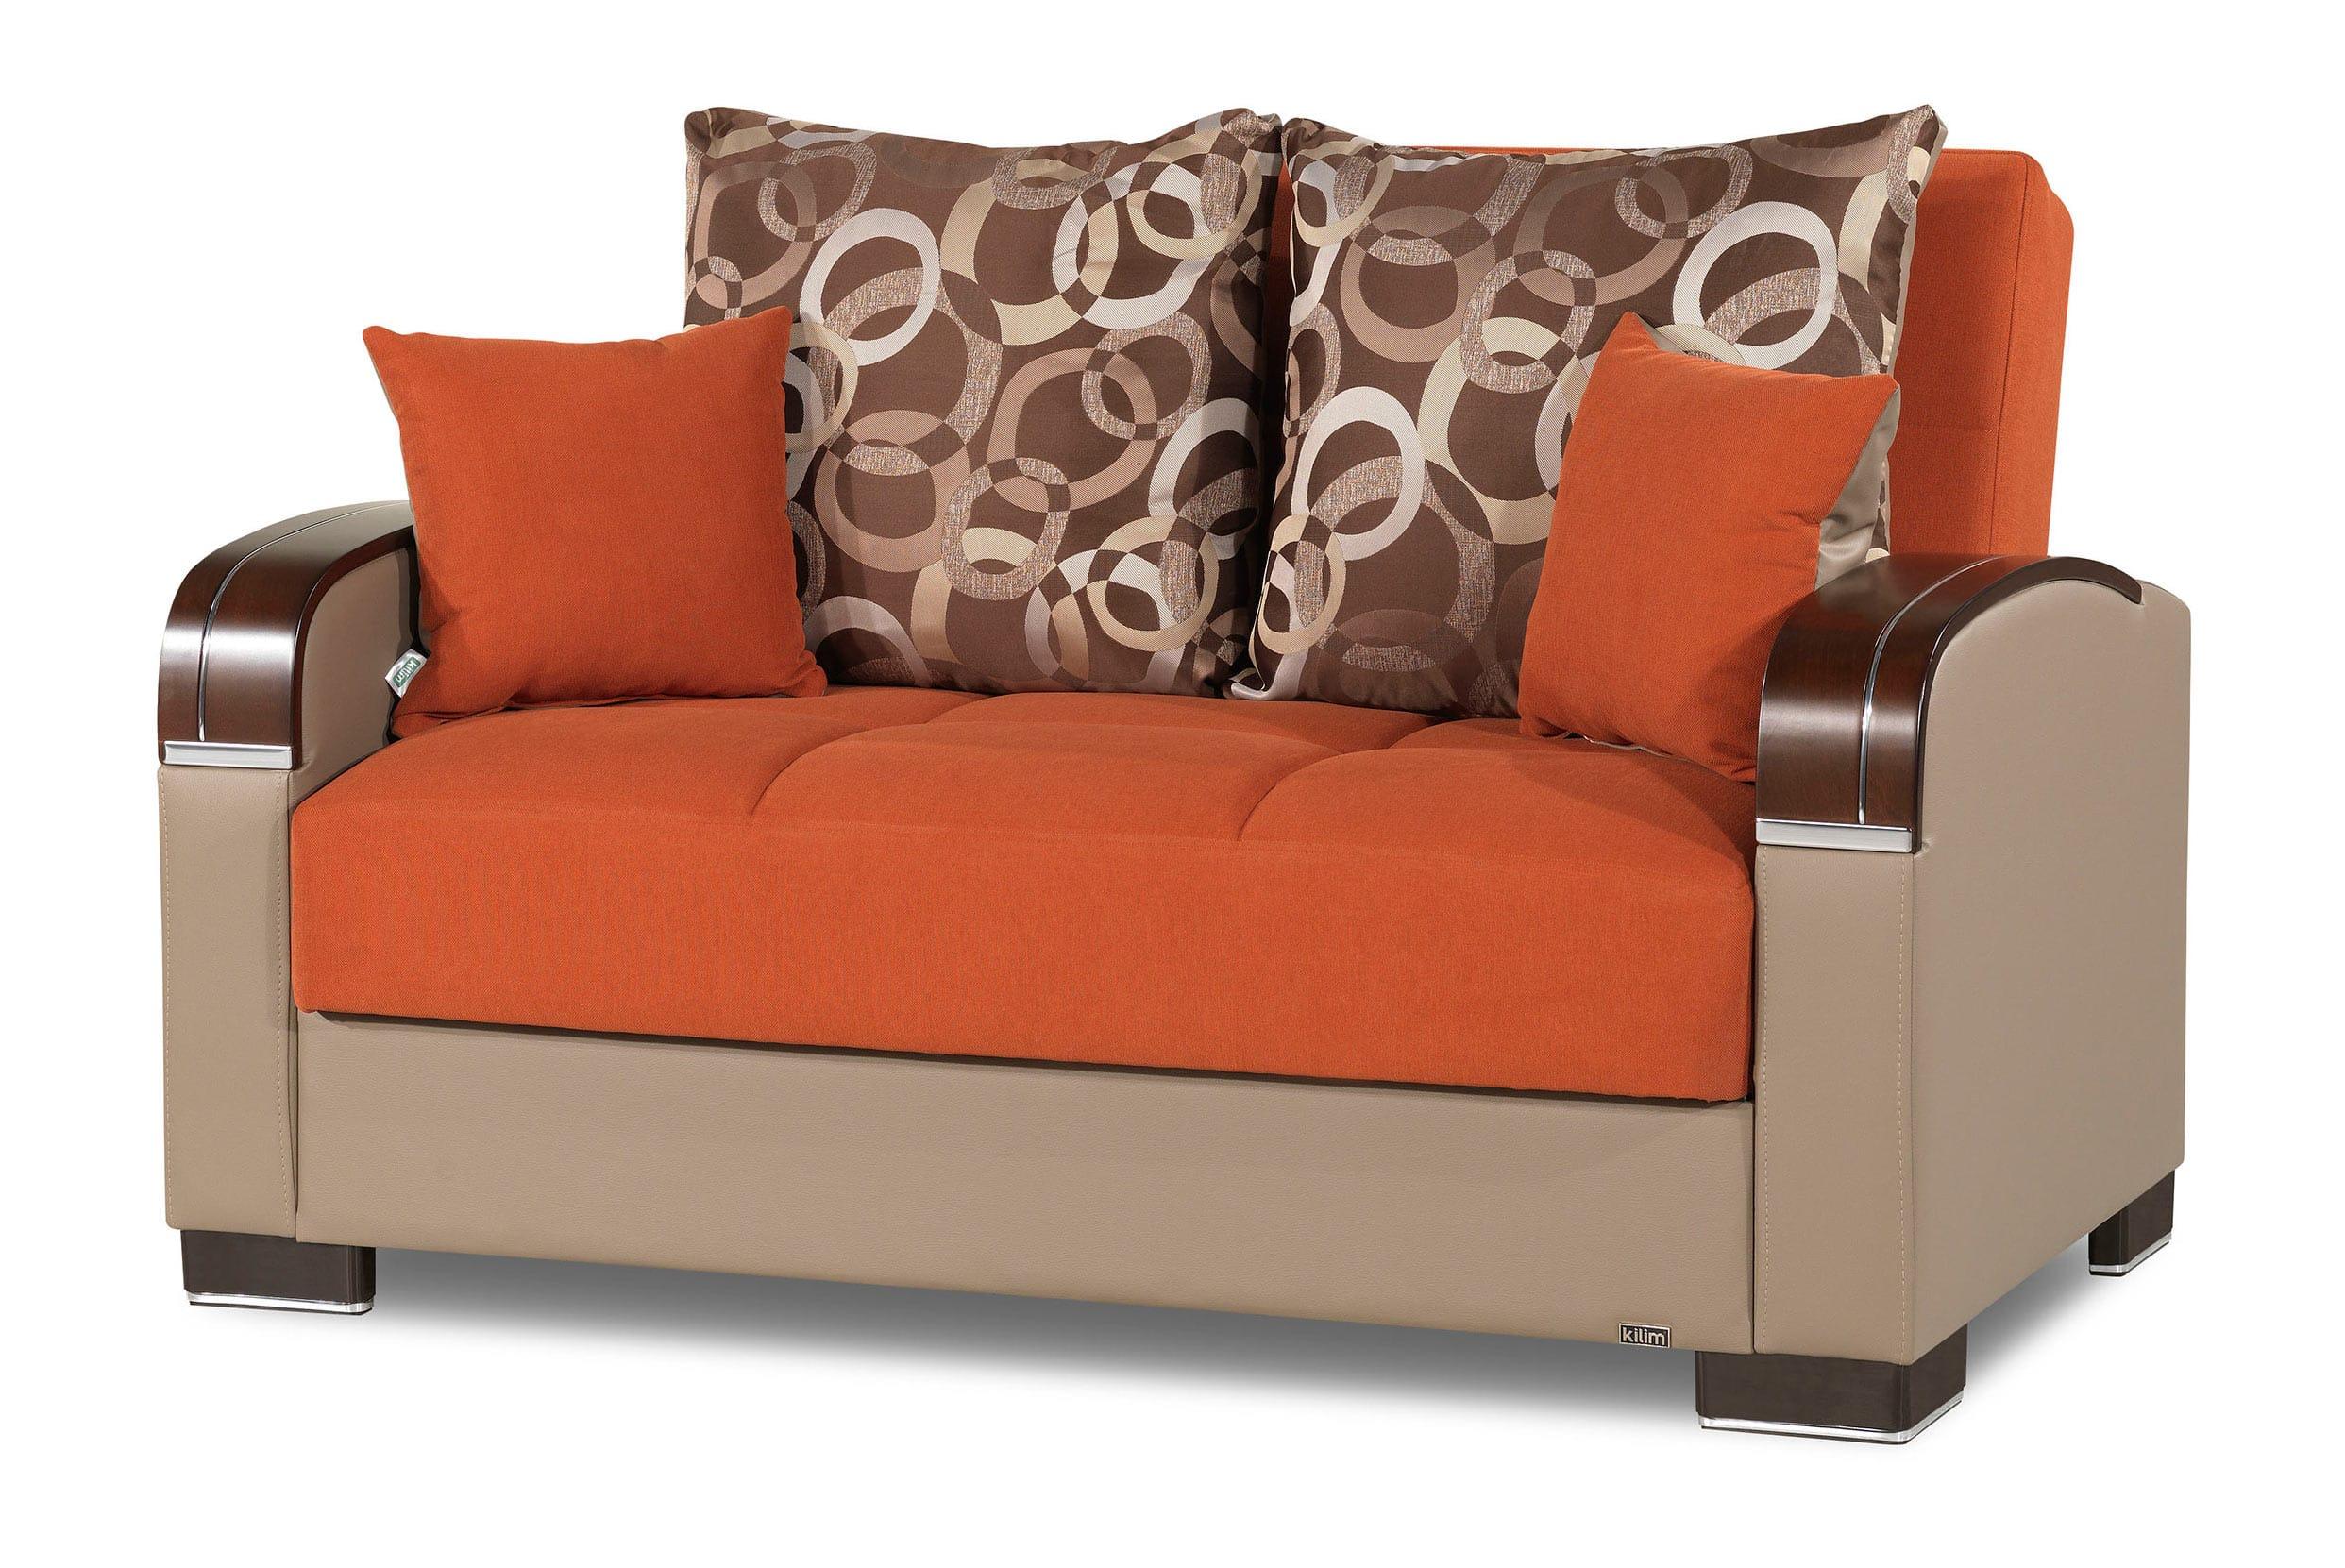 Mobimax Orange Loveseat by Casamode